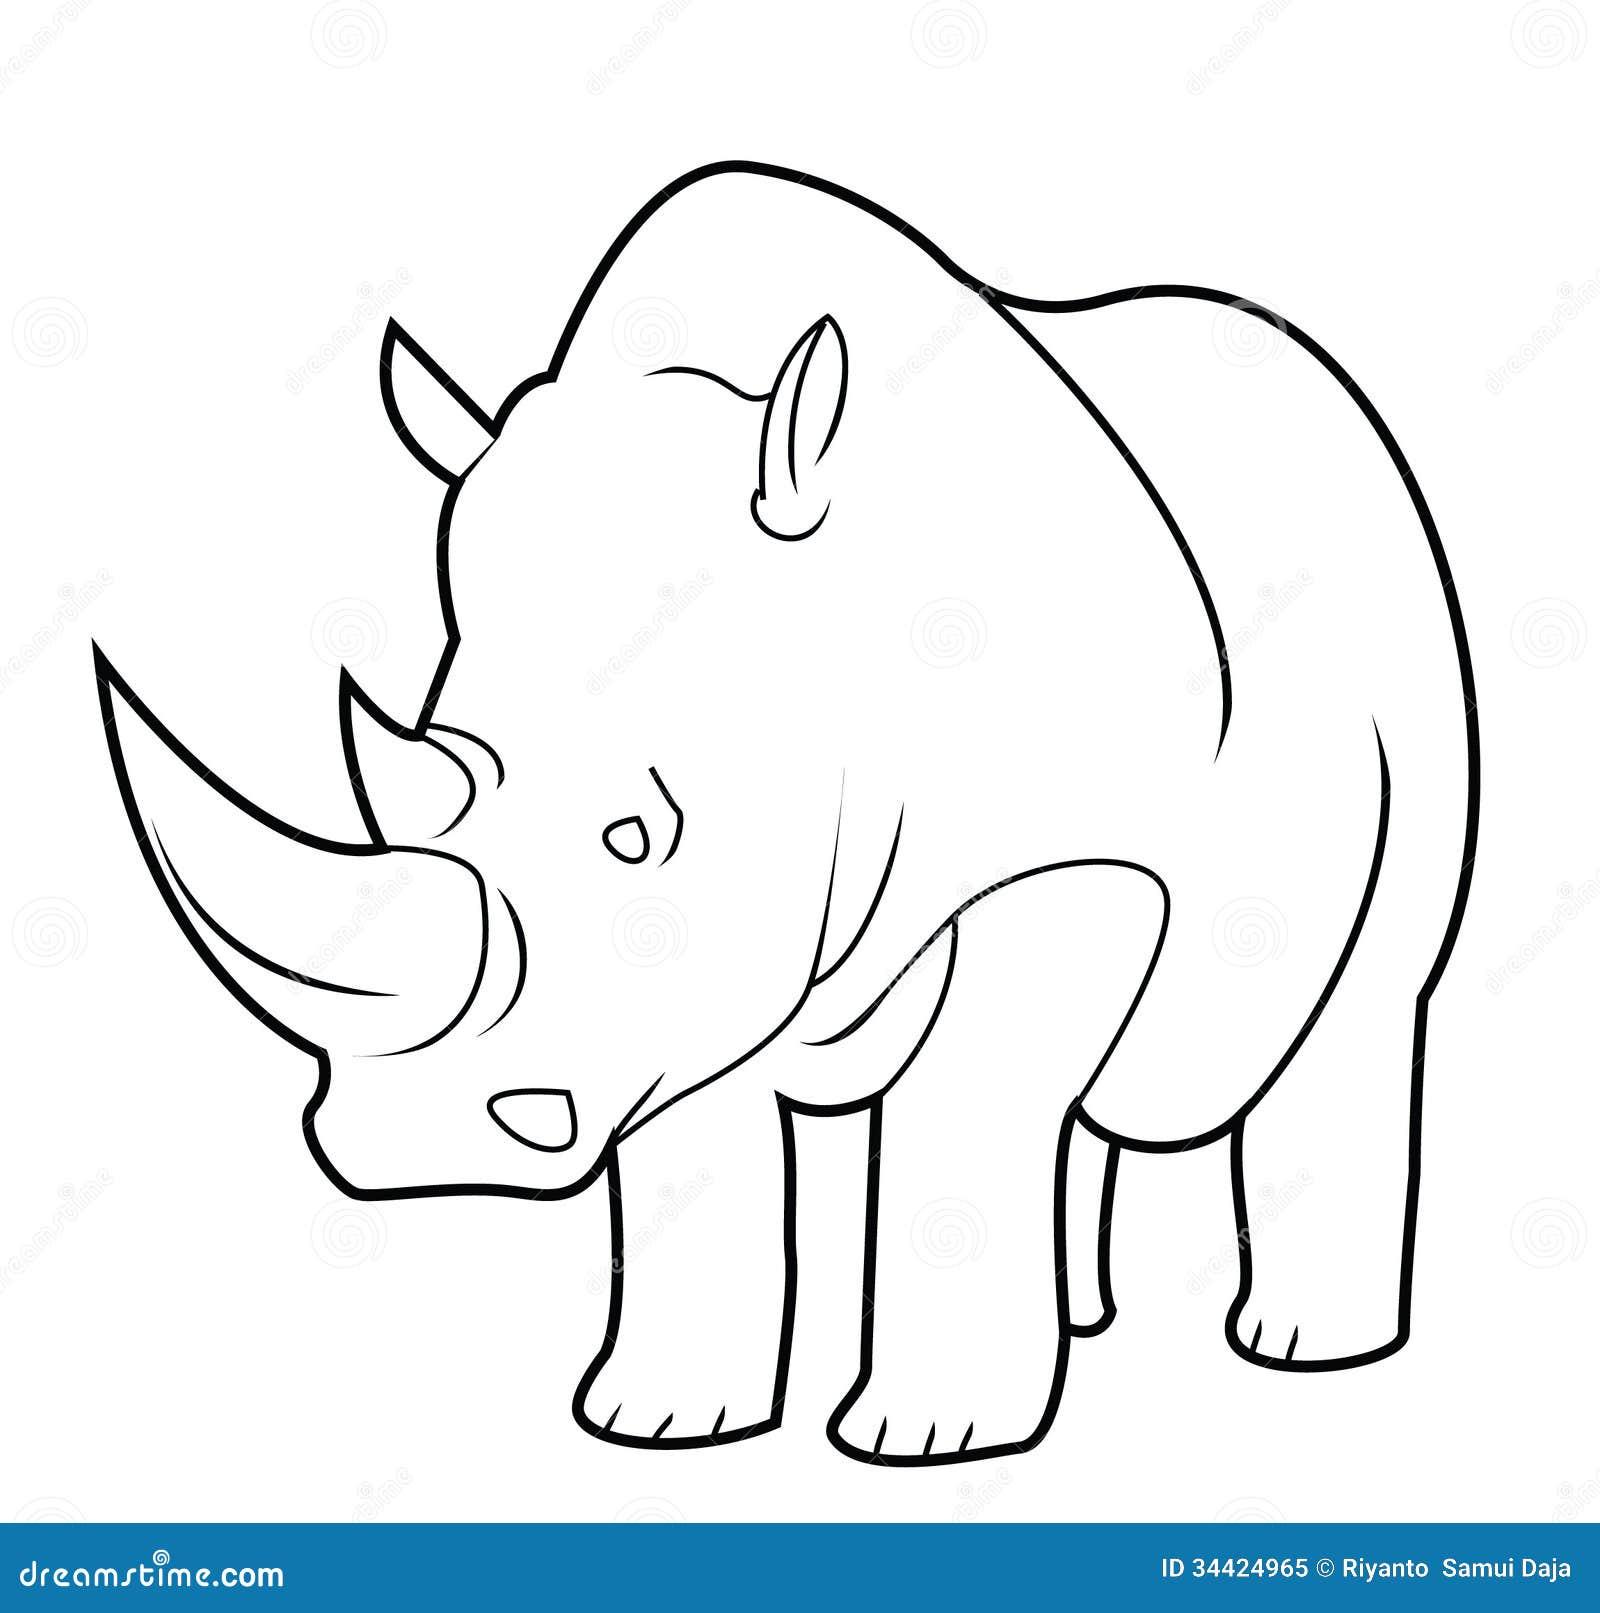 Rhino Royalty Free Stock Photo  Image 34424965